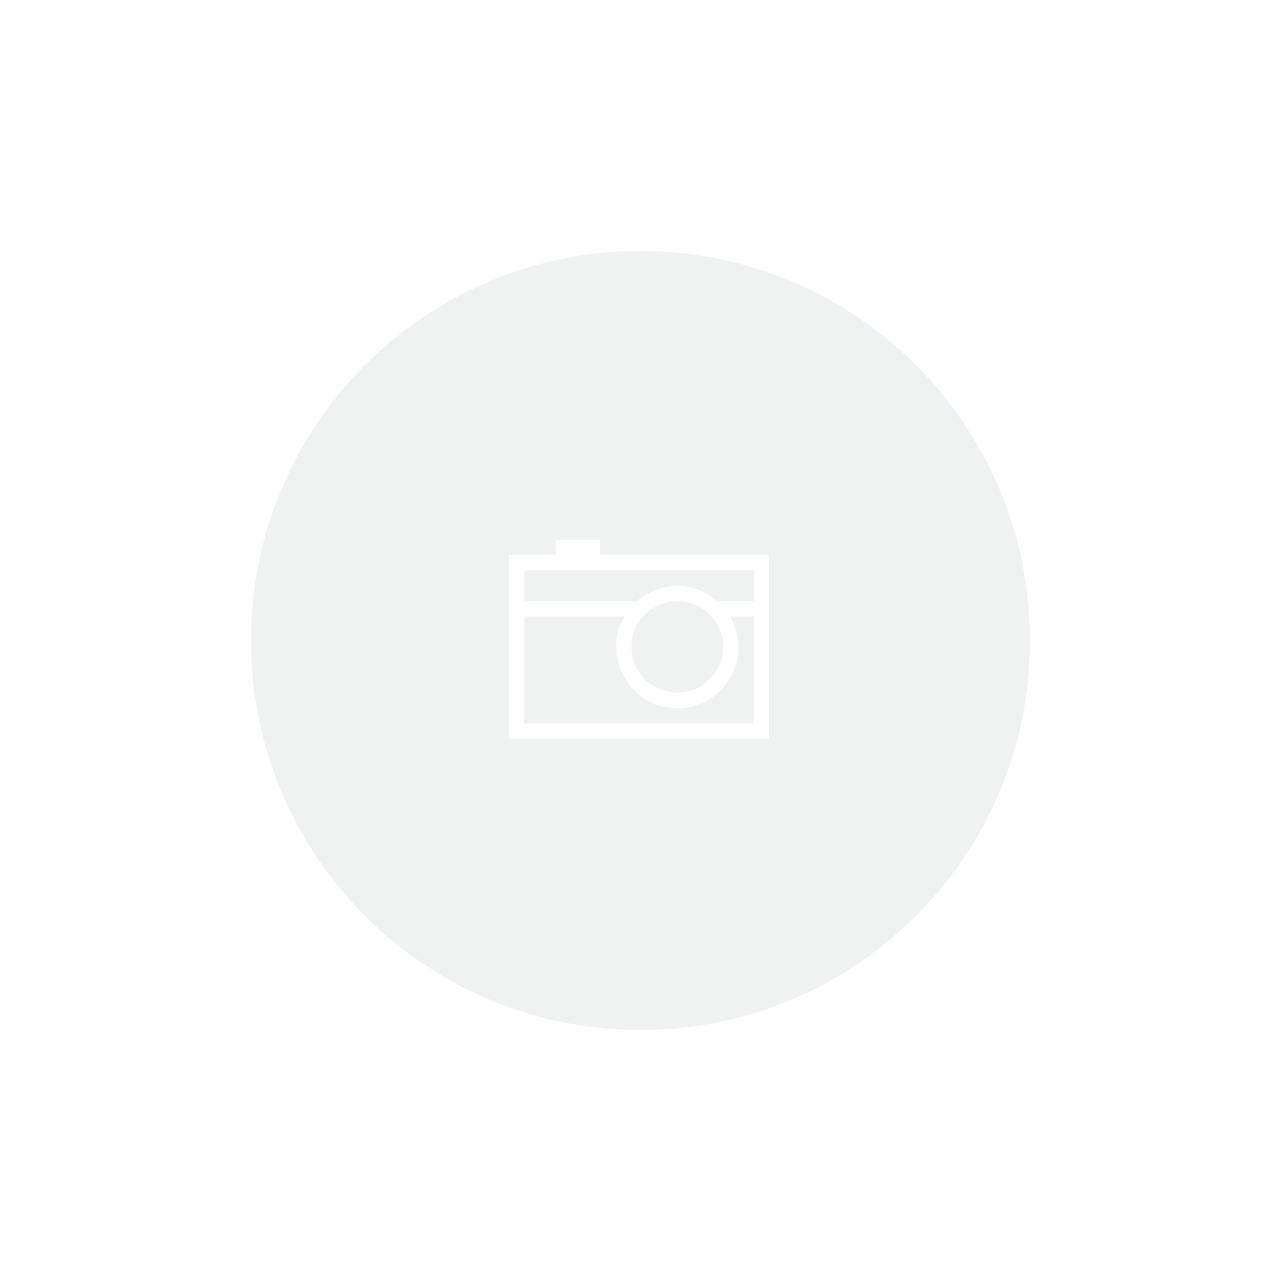 Coifa Inox Vidro New Vetro Flex 75cm 110v Tramontina